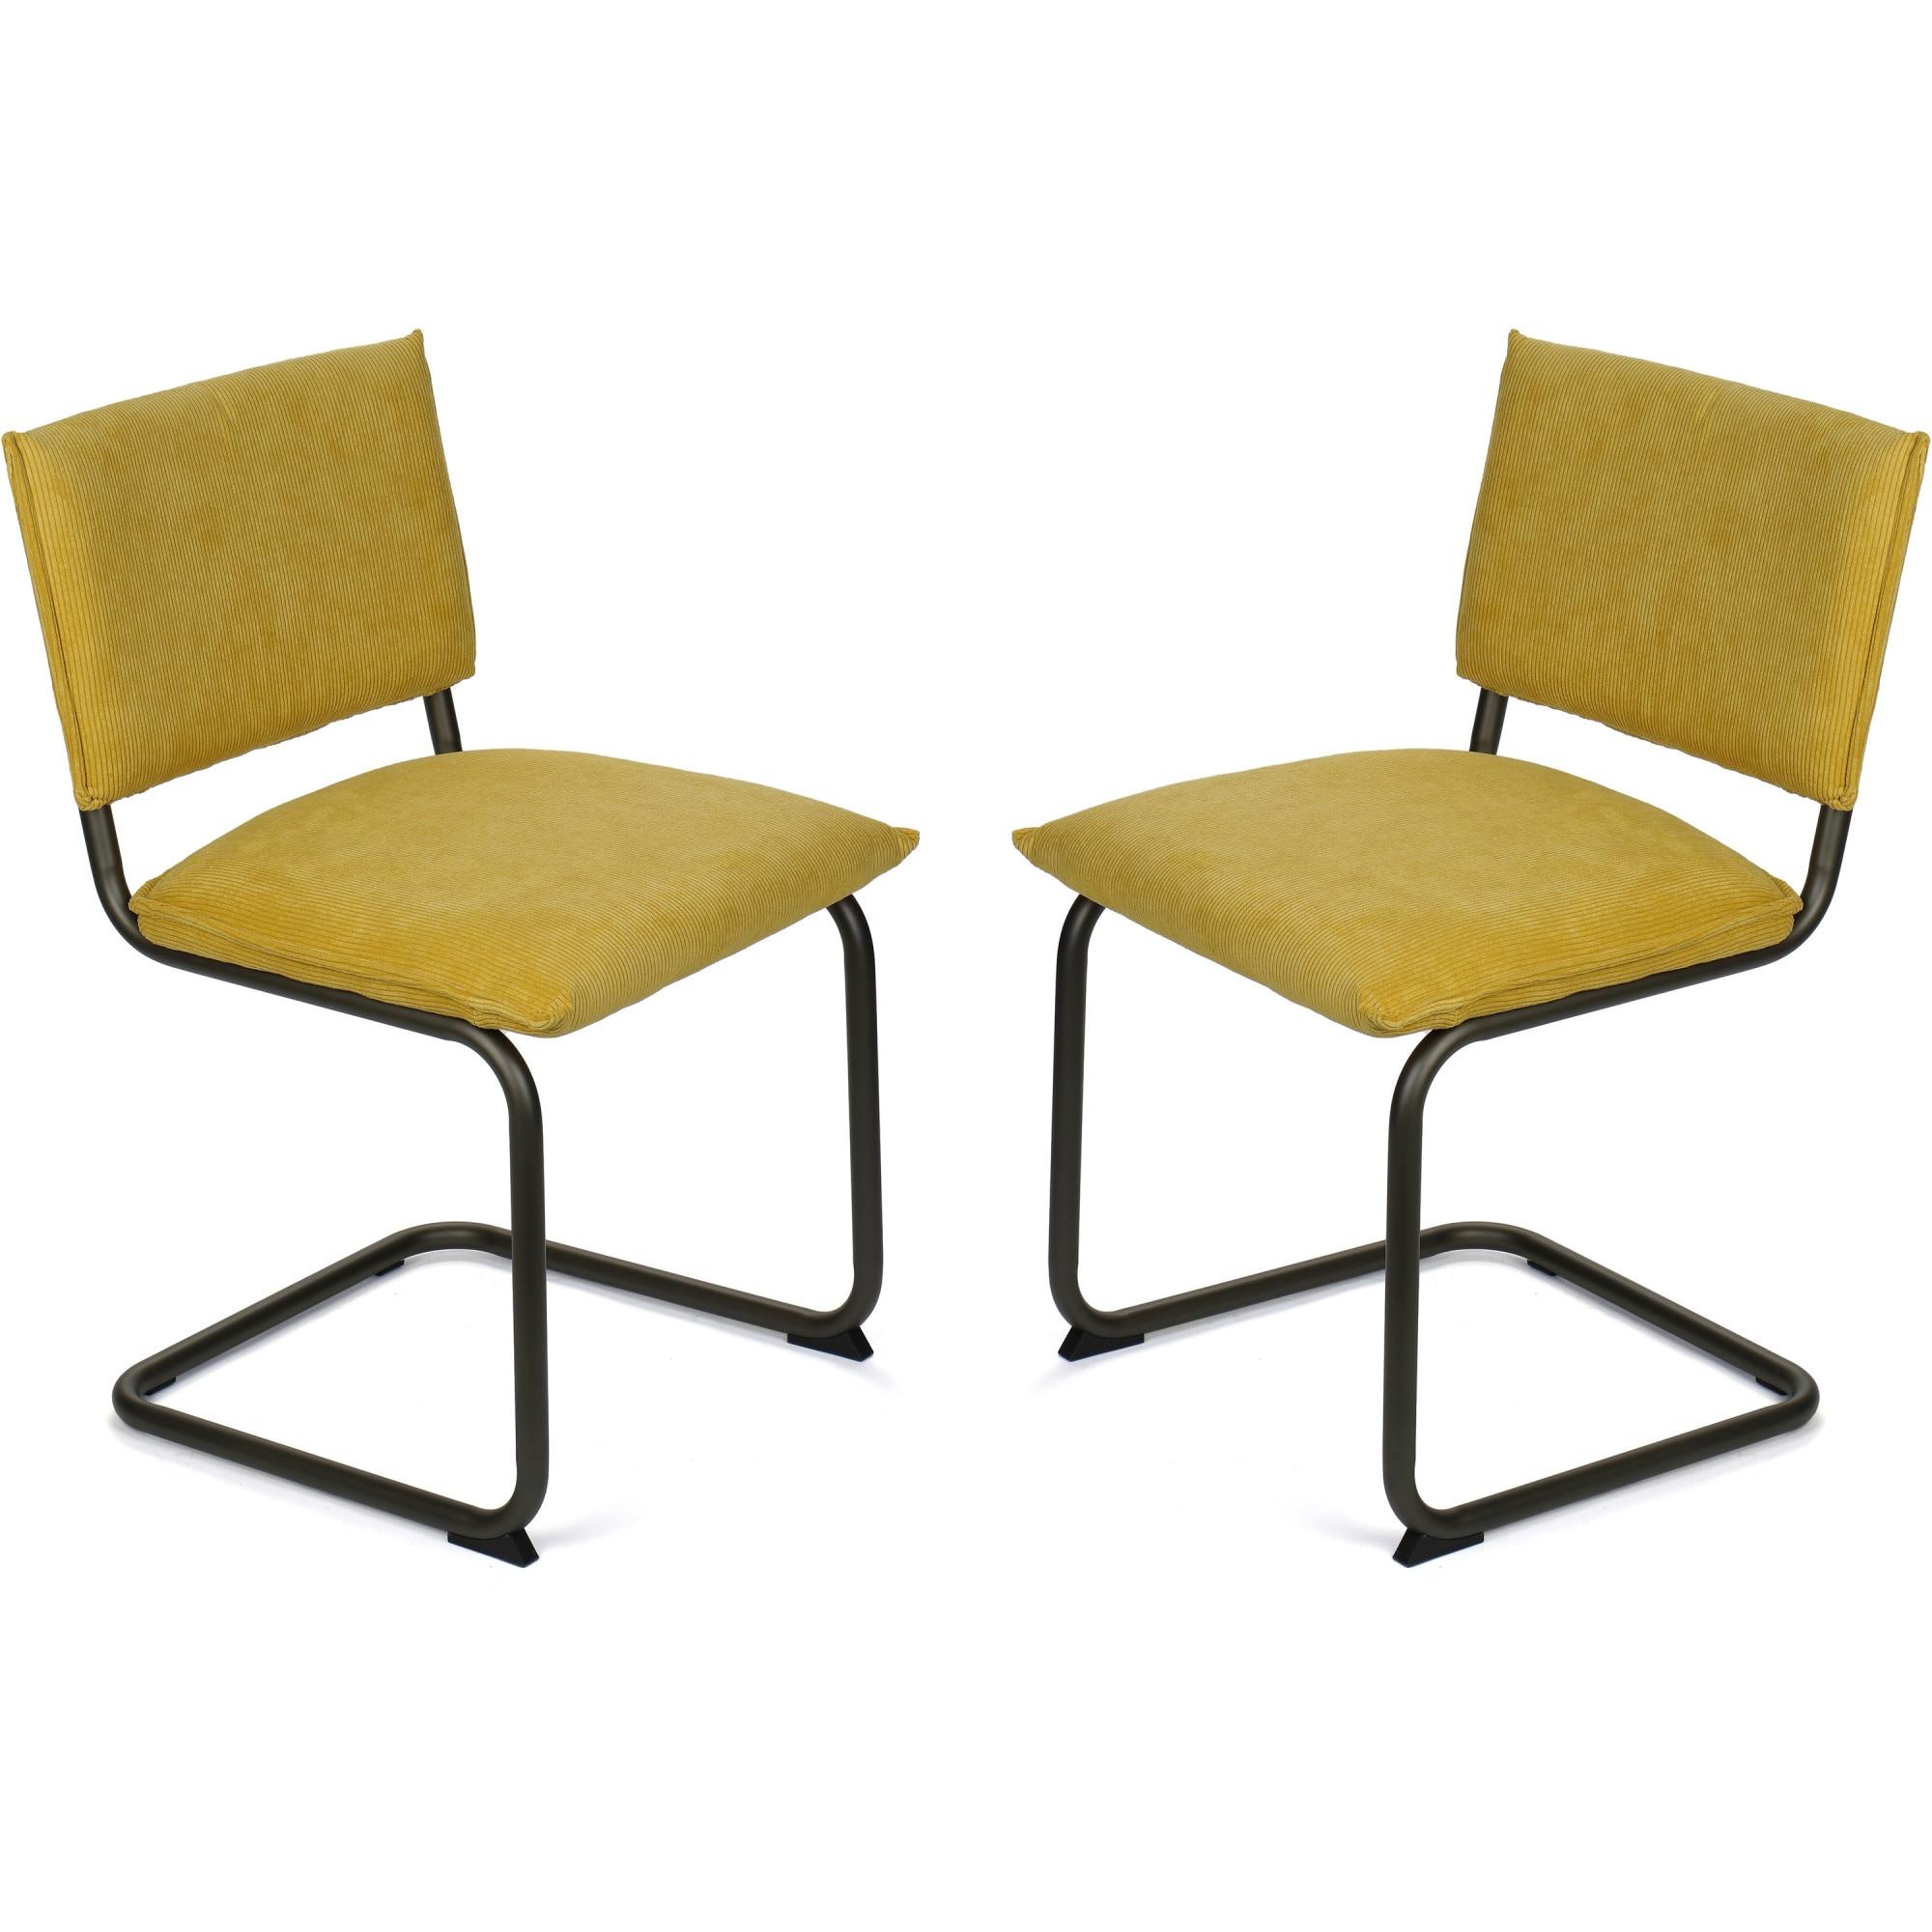 Fotografie Set 2 scaune Kring Chicago, metal si material textil, Galben Curry